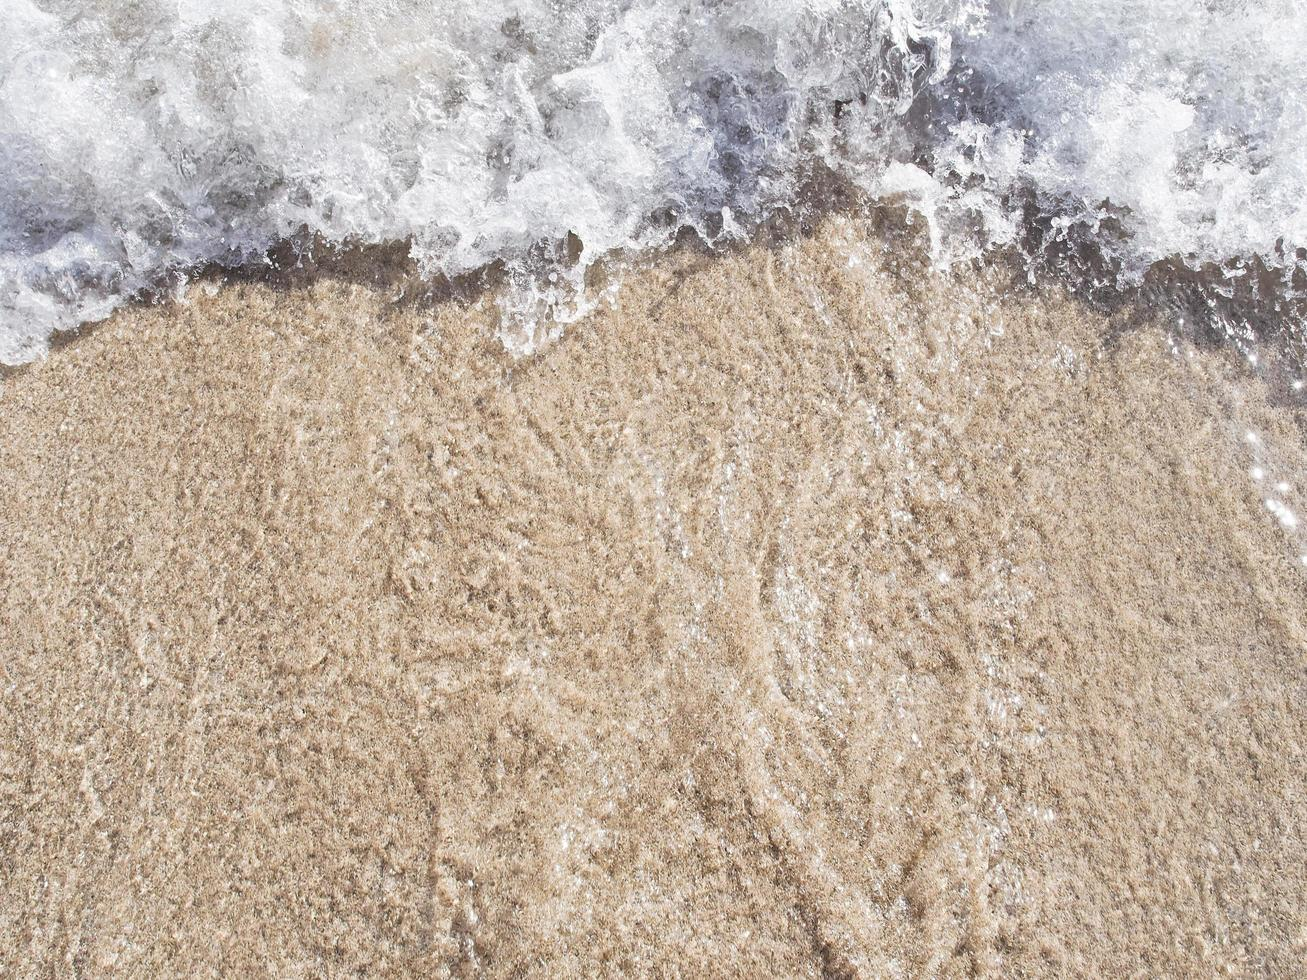 ola de playa waikiki foto